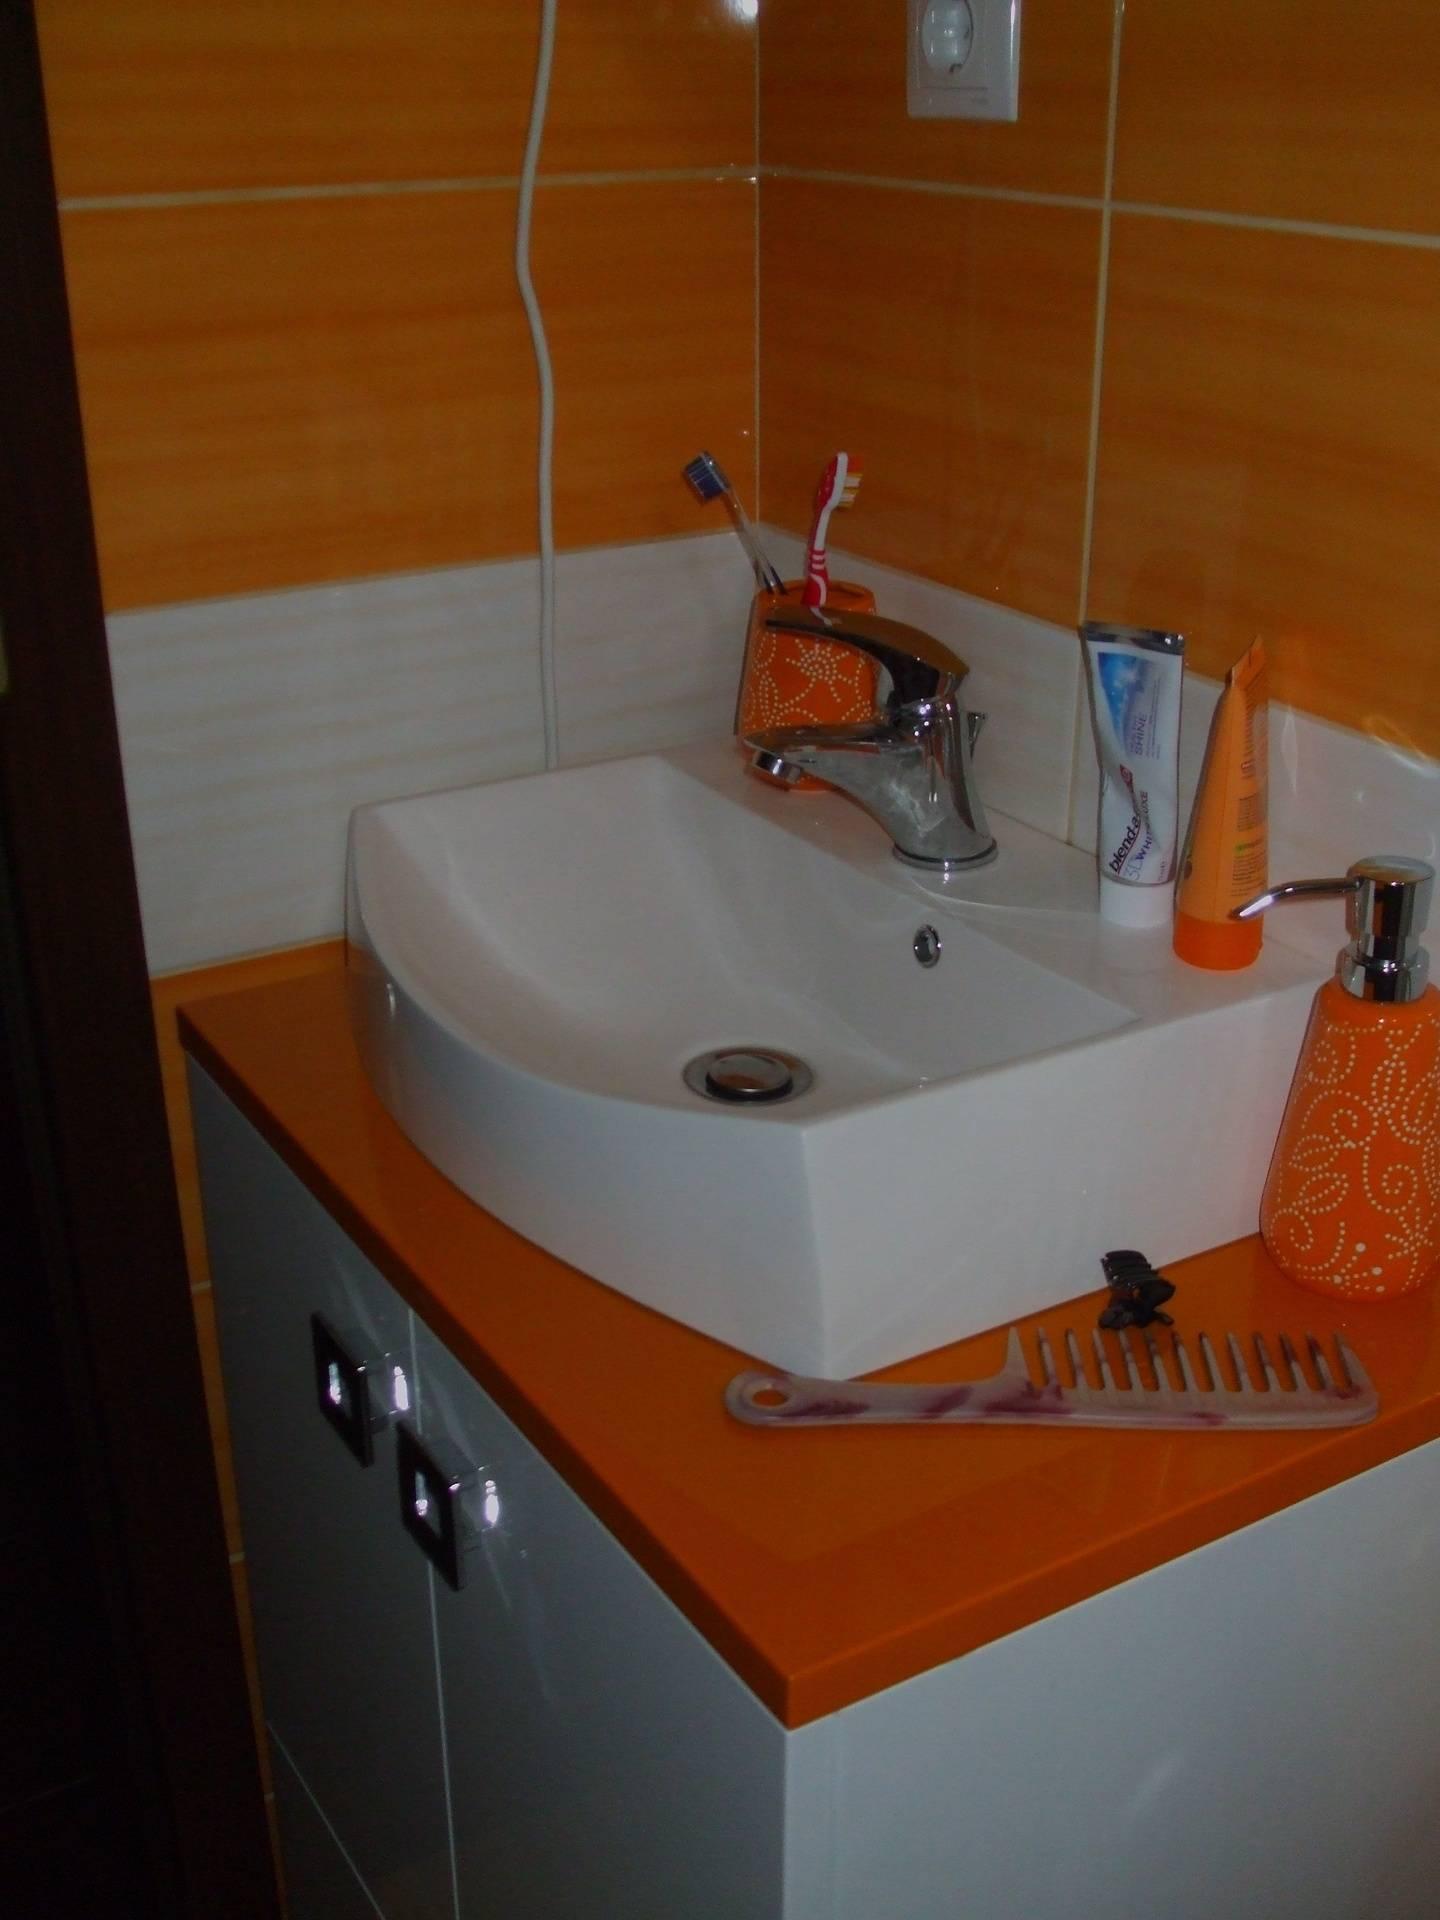 Mobila baie lavoar blat de nuanta orange si corp lavoar alba